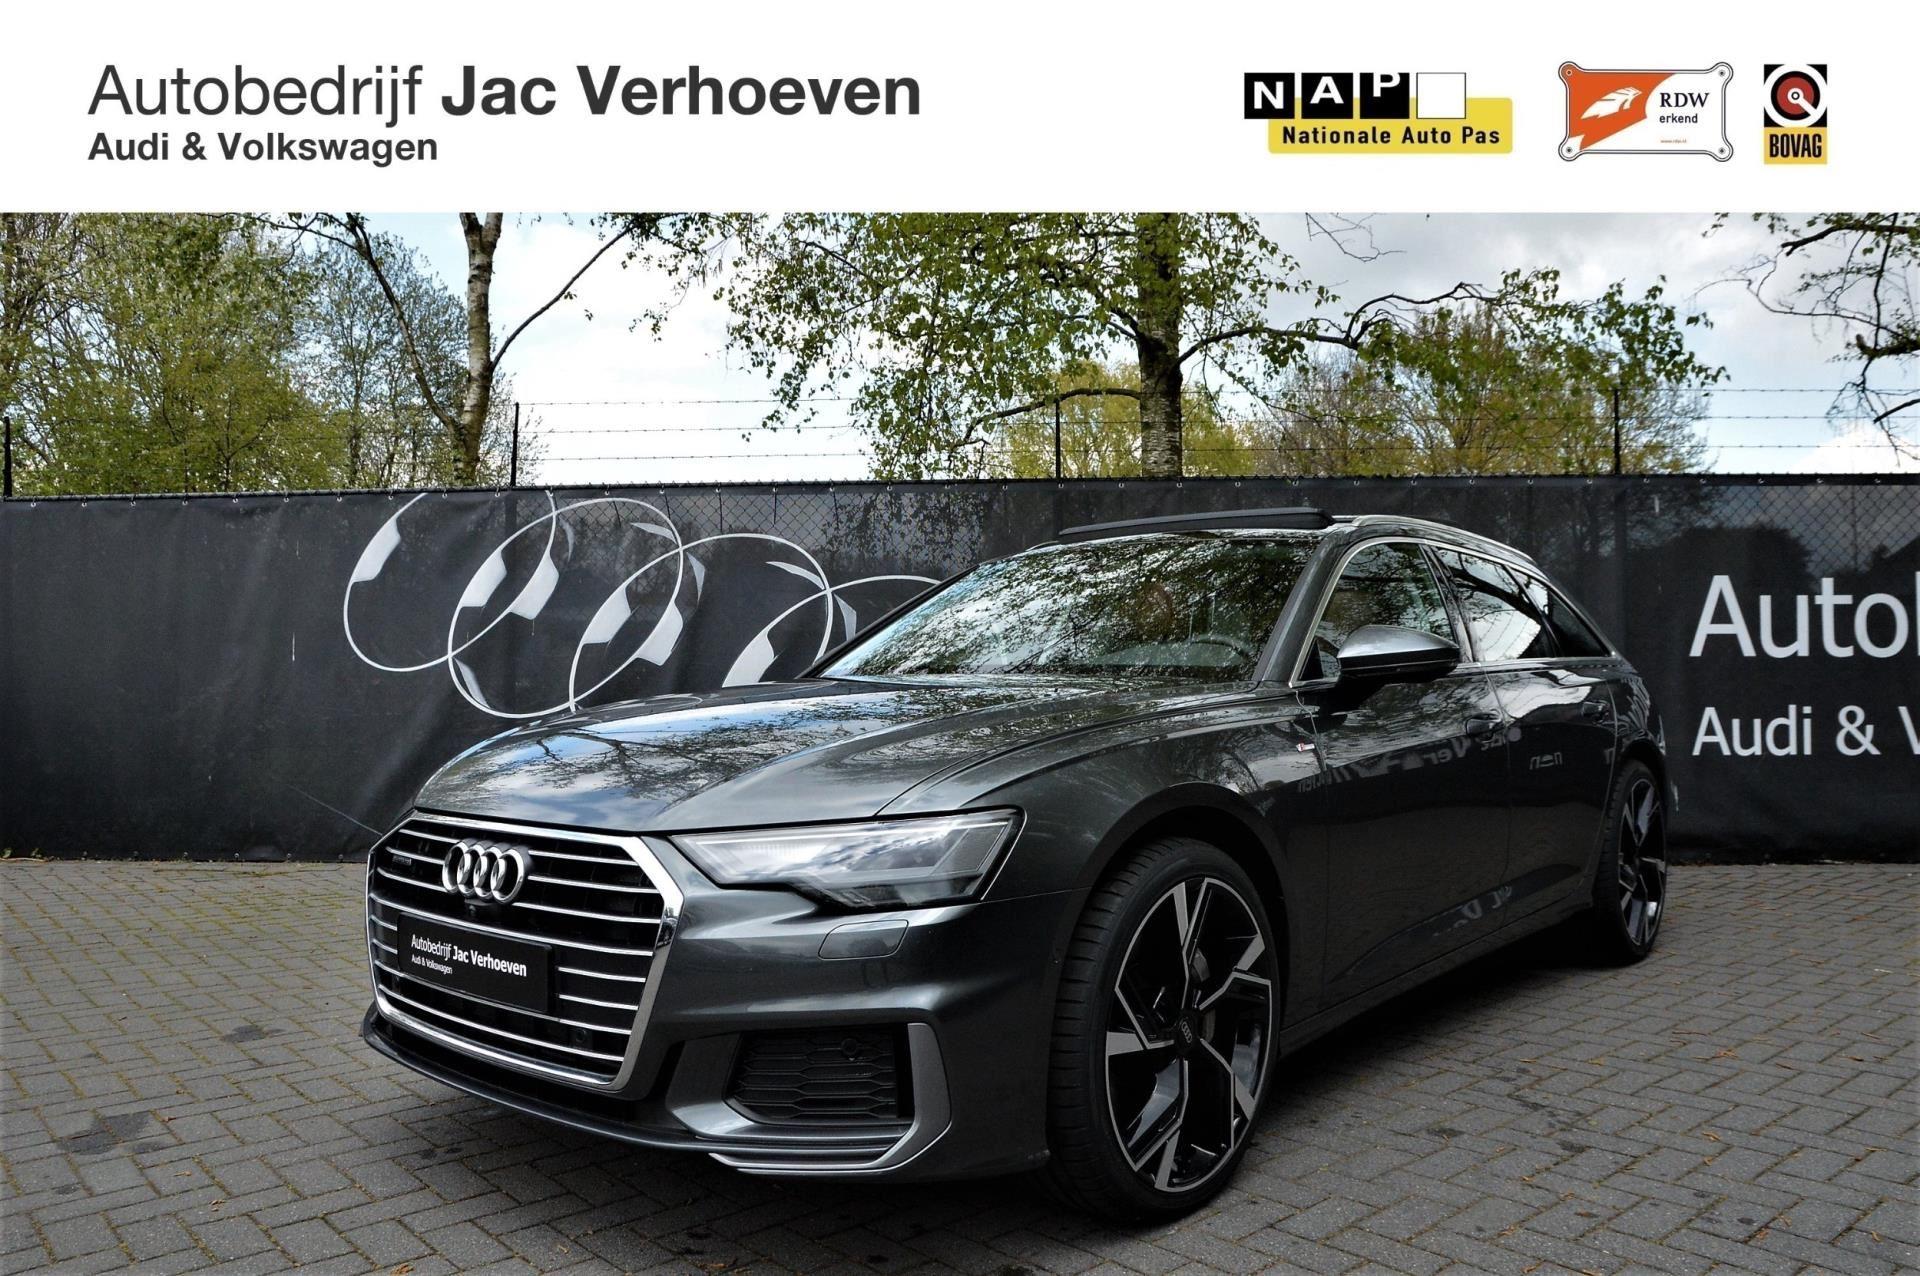 Audi A6 Avant occasion - Autobedrijf Jac Verhoeven